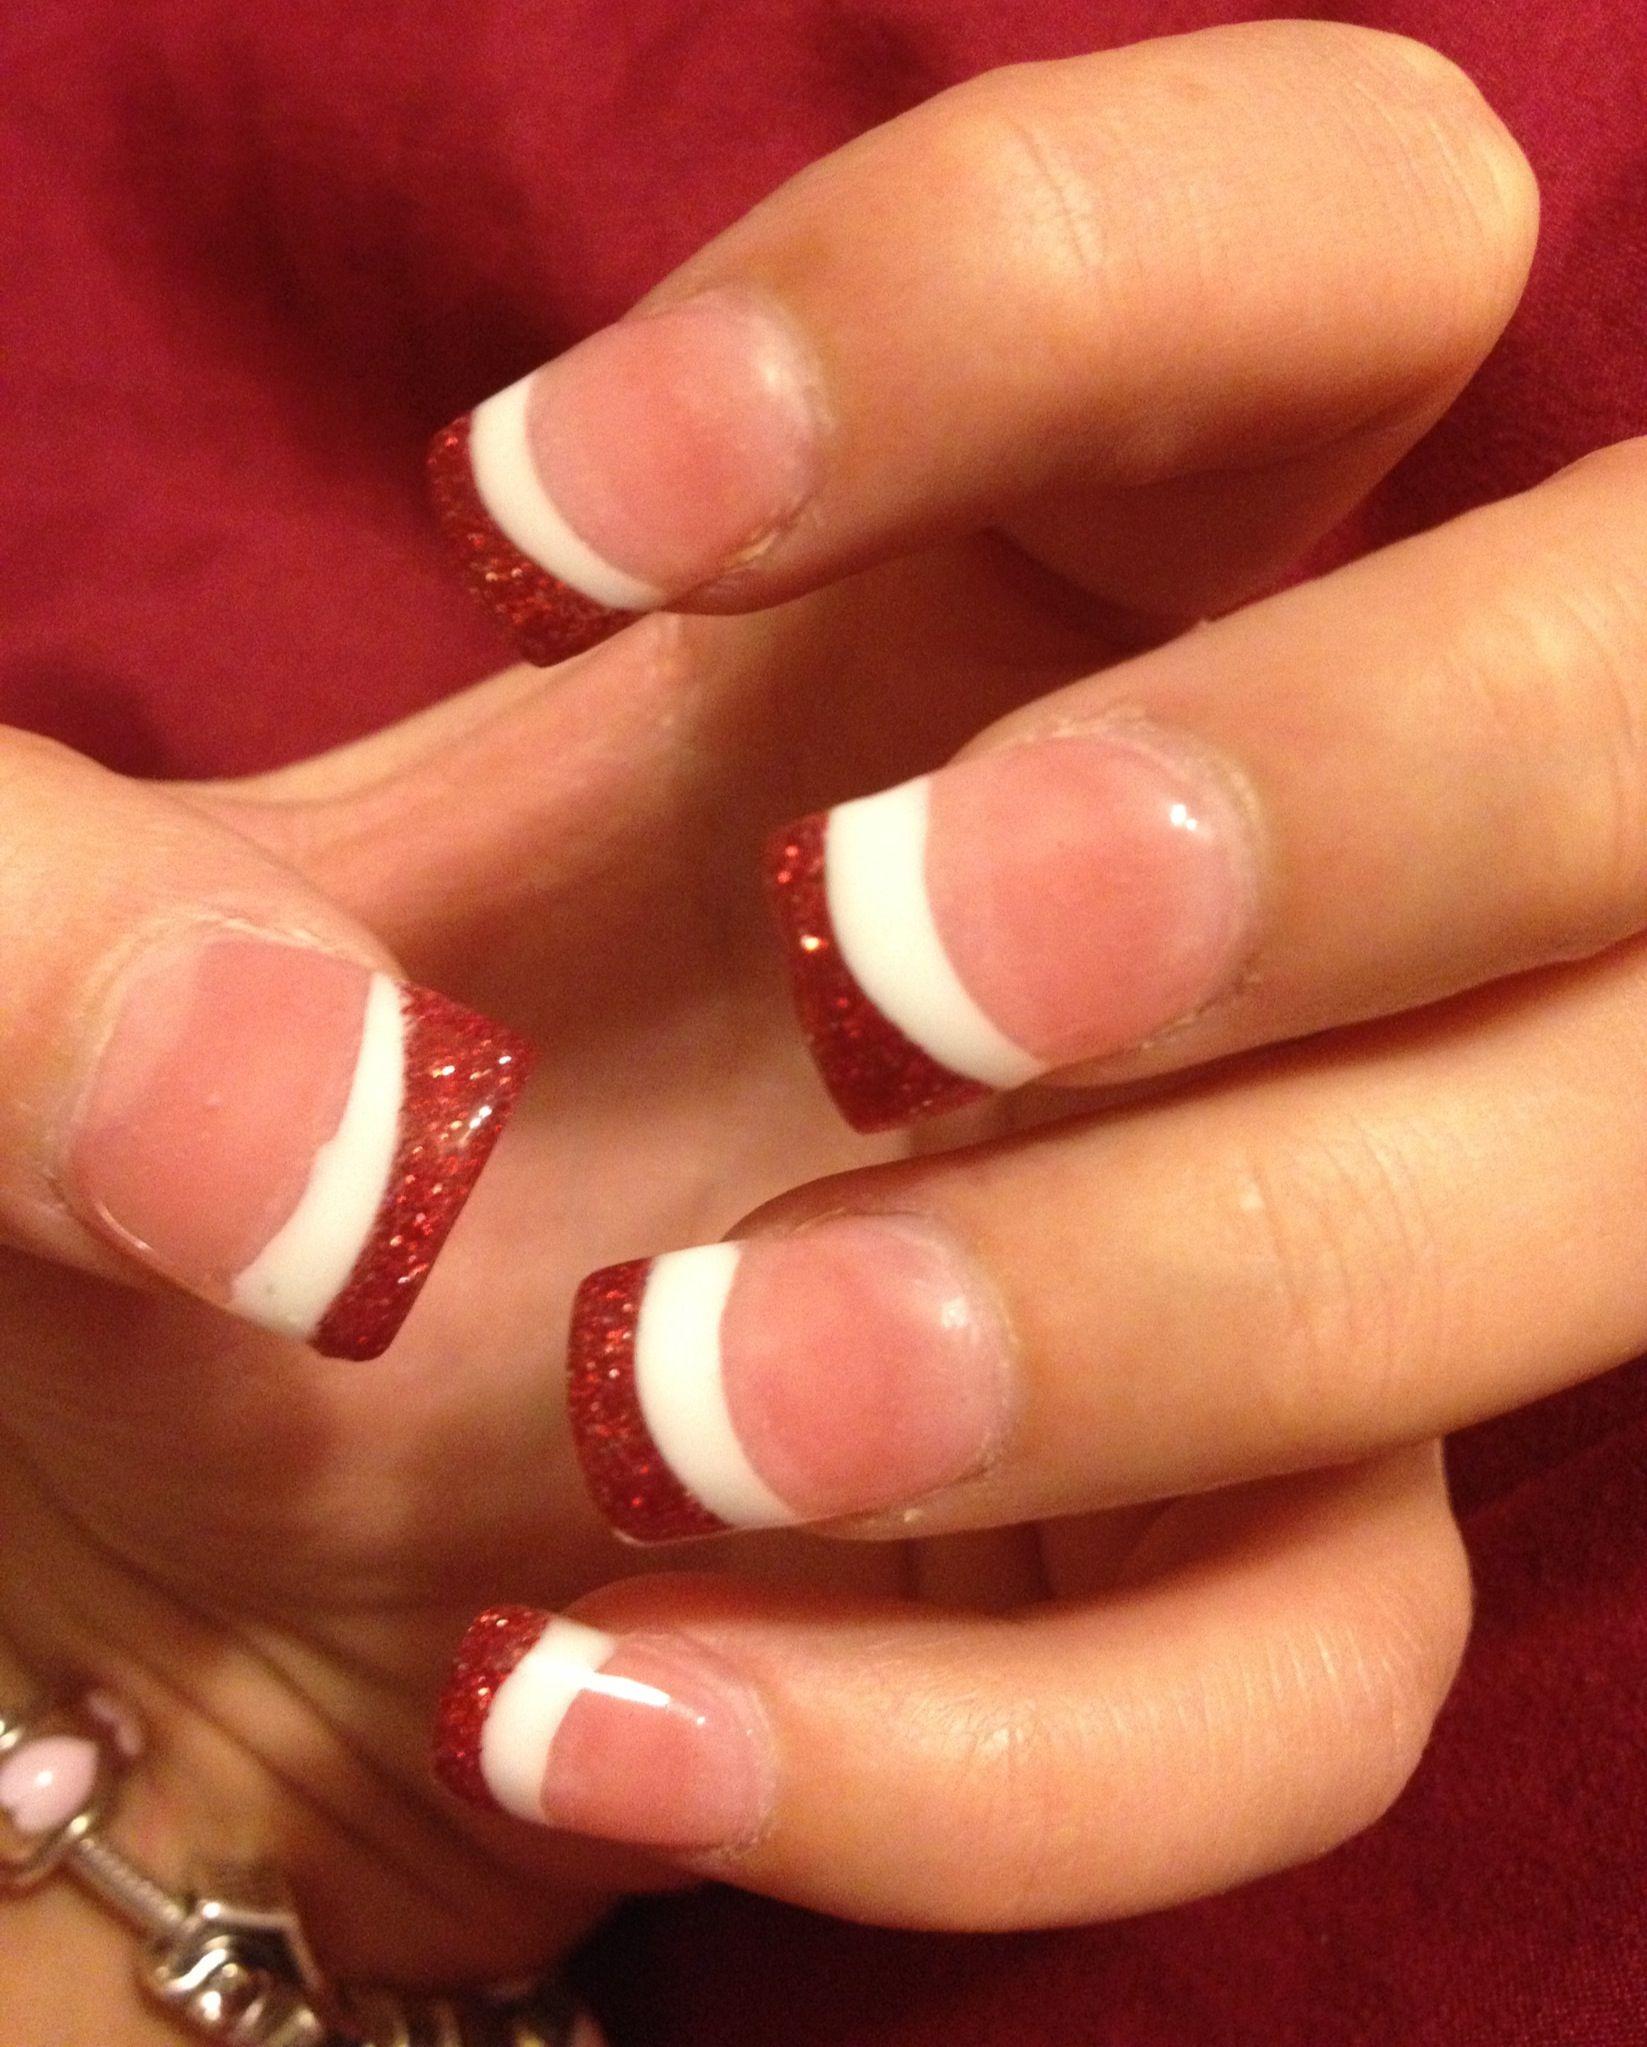 Acrylic (Gel) red french tip nails :) #wedding #nails   mani-pedi ...